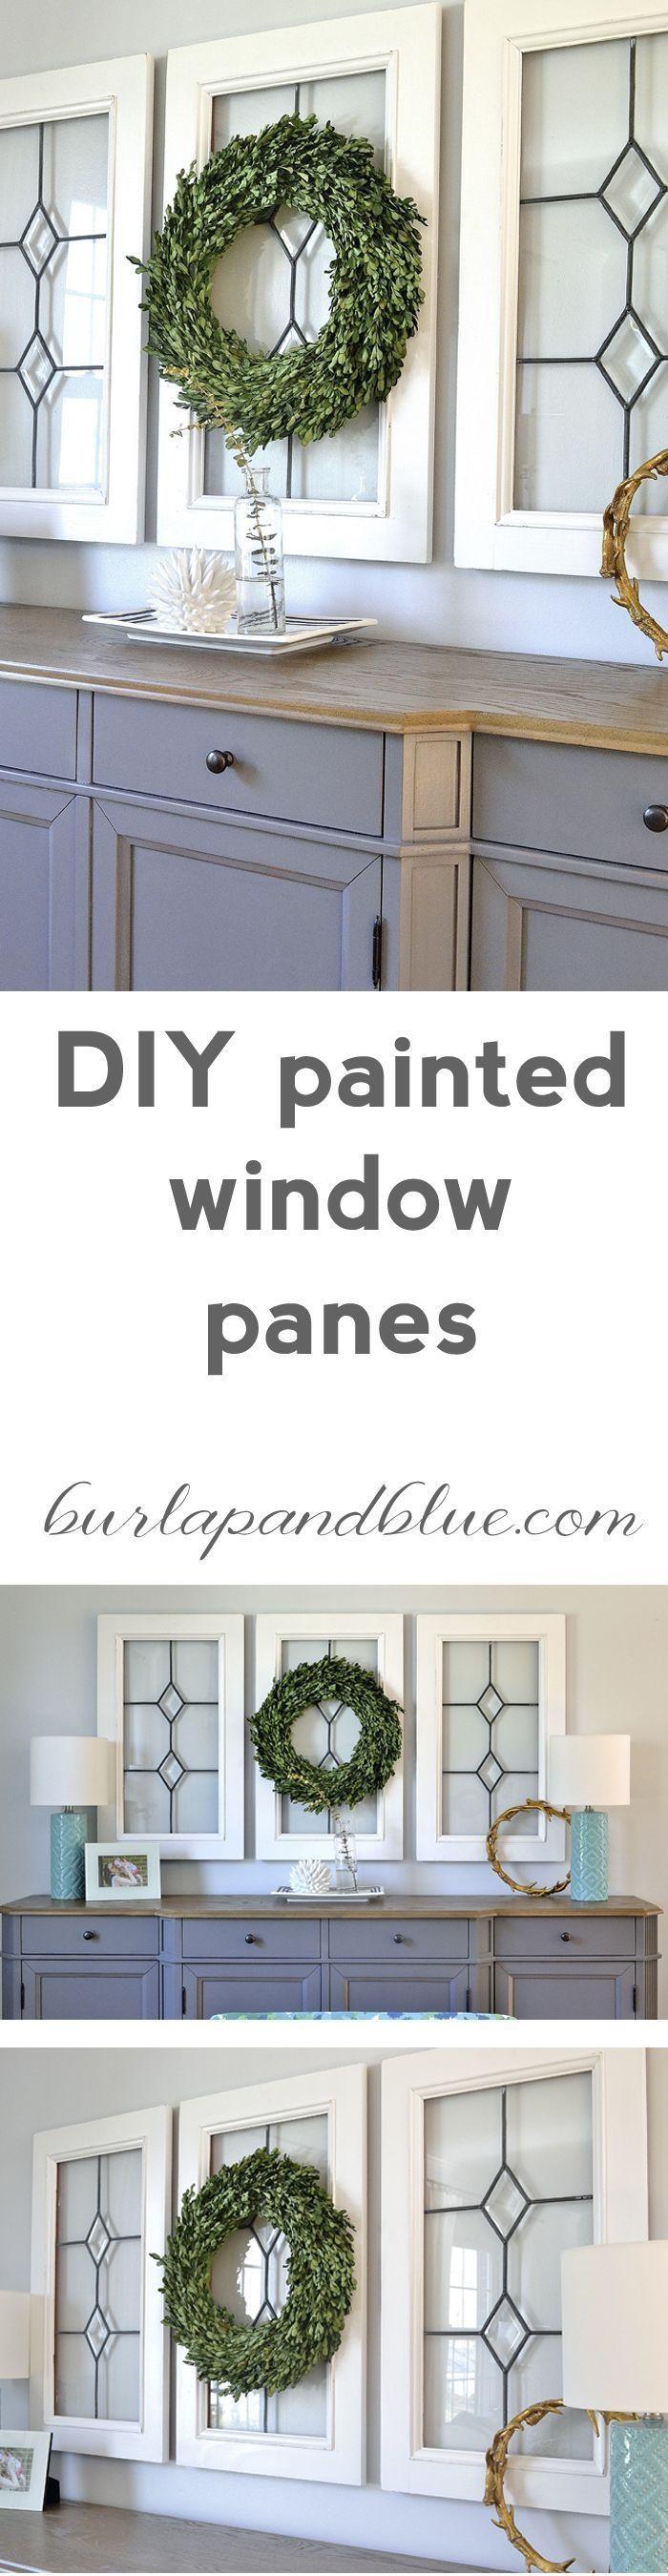 Best 25+ Mirror Wall Art Ideas On Pinterest | Cd Wall Art, Mosaic Within Diy Mirror Wall Art (View 13 of 20)